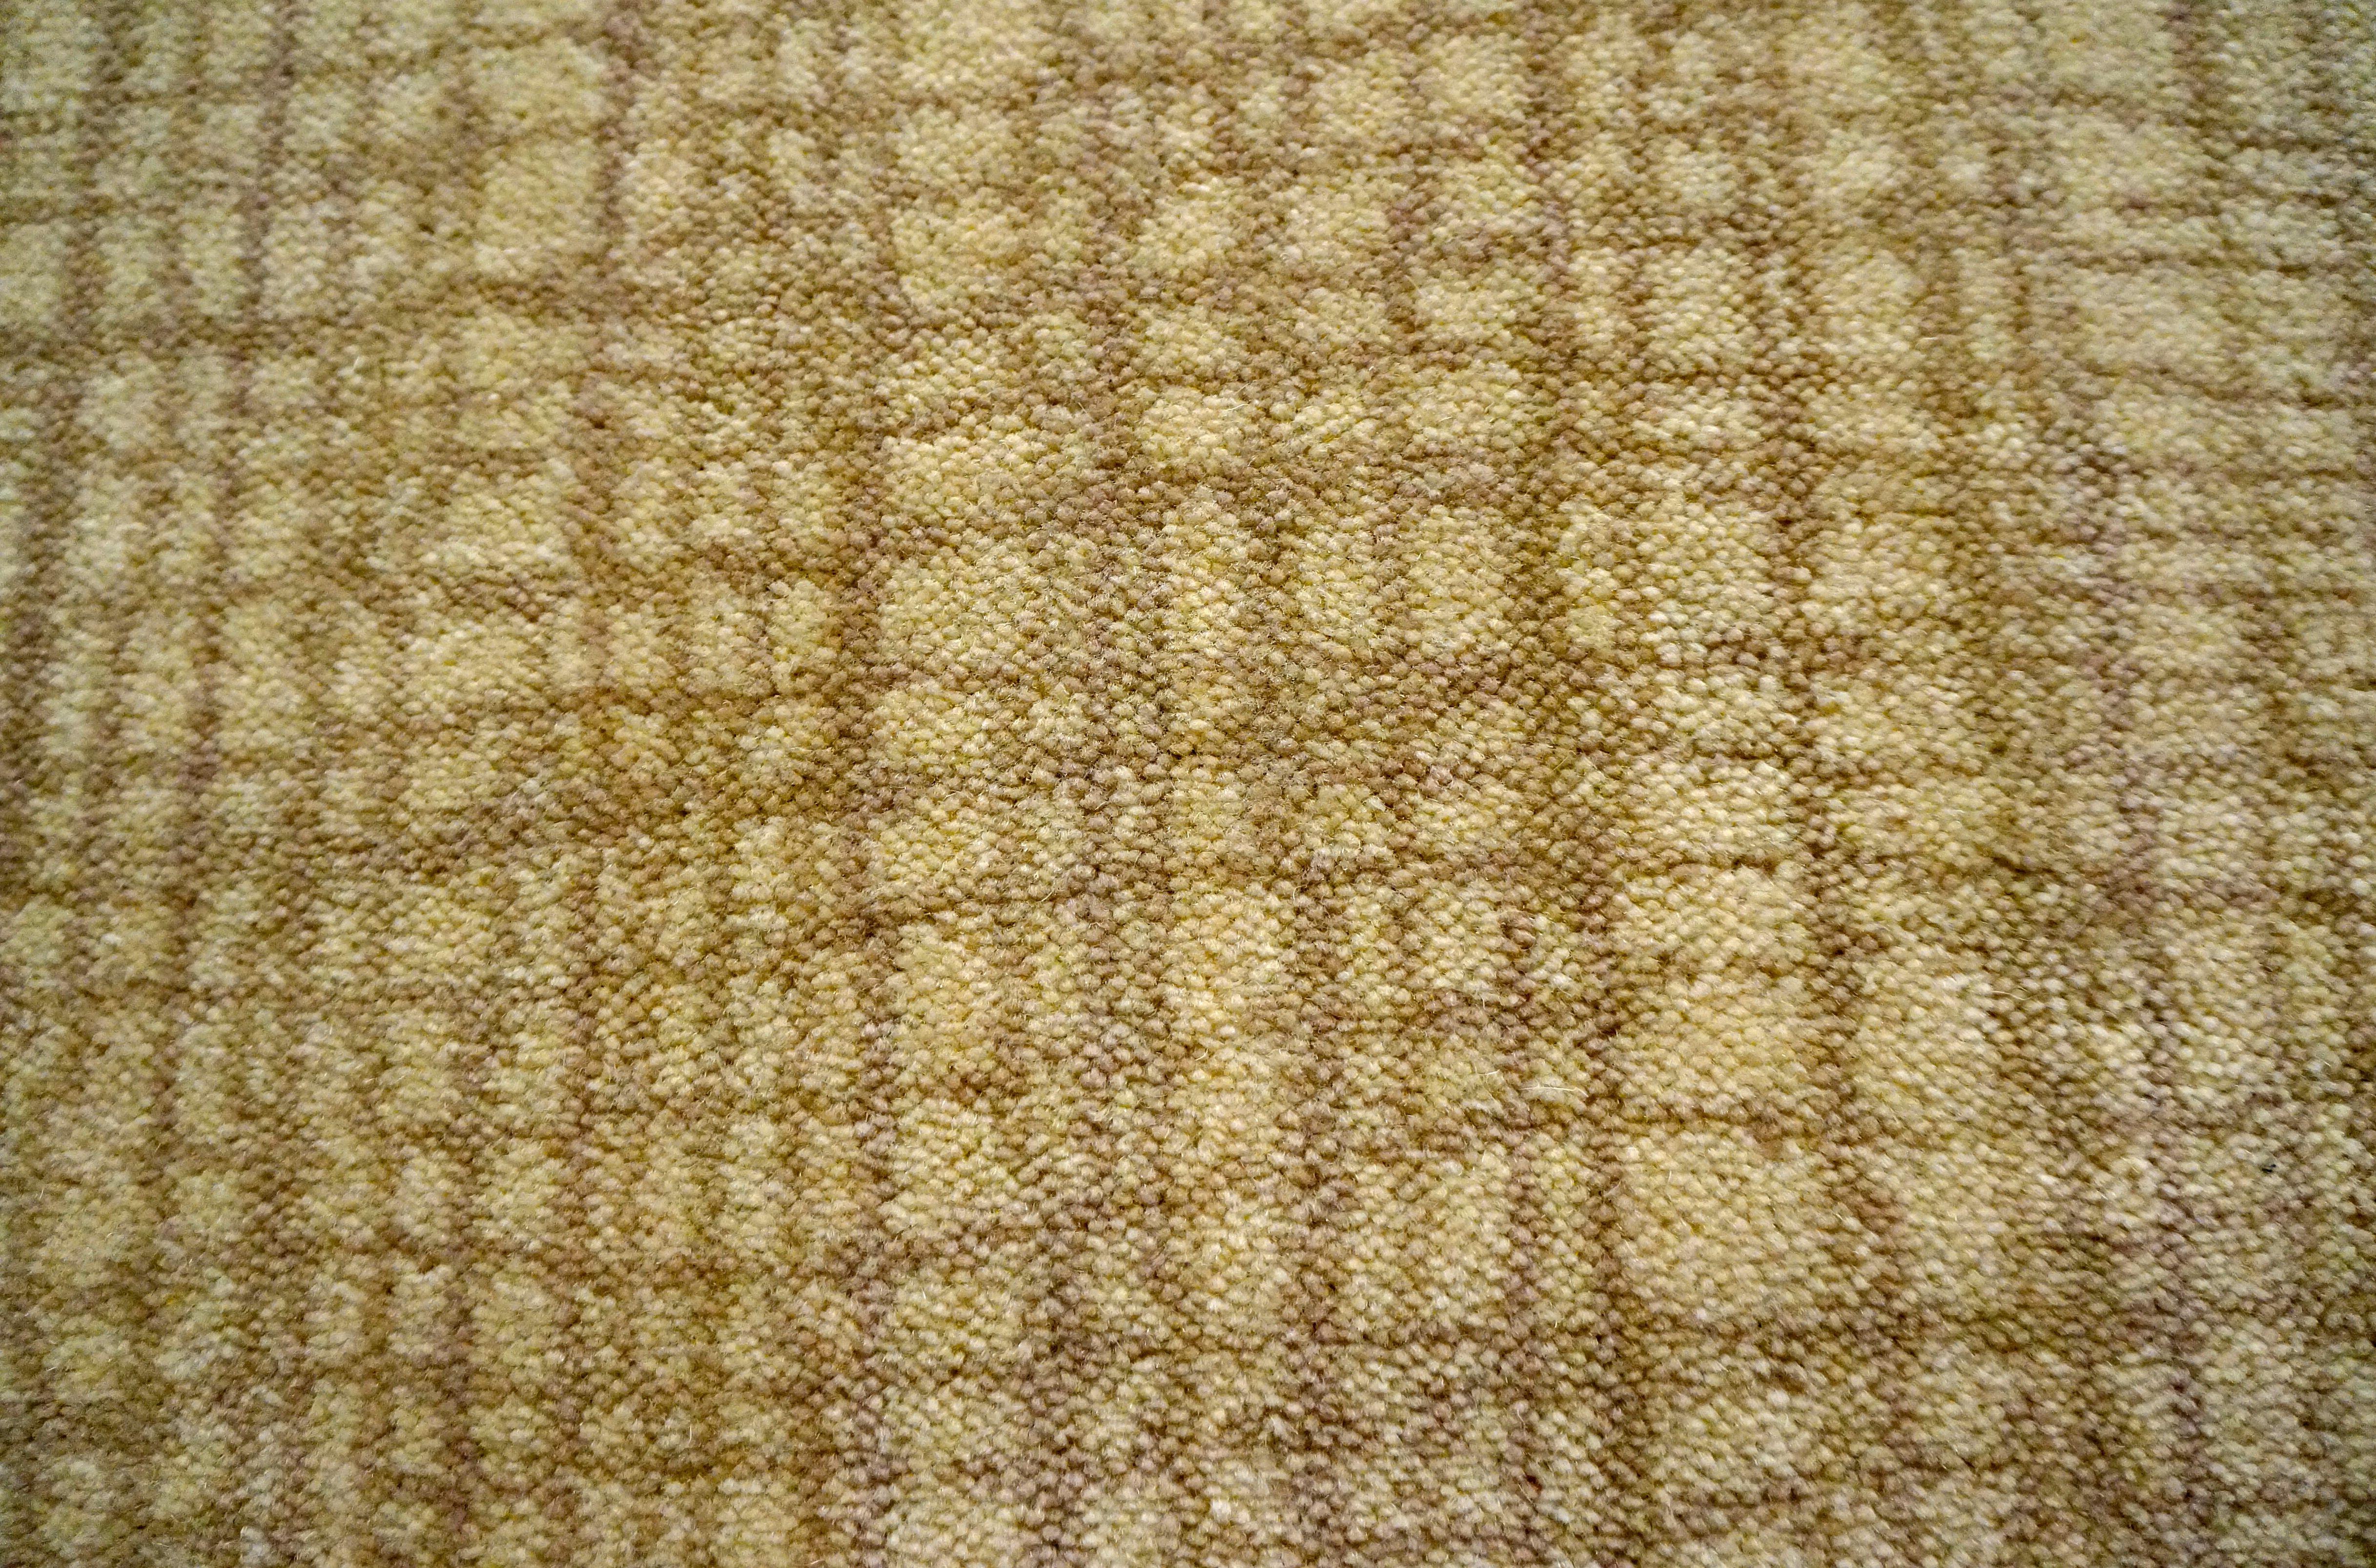 Karastan Wool Carpet New Introductions 2014 Wool Carpet